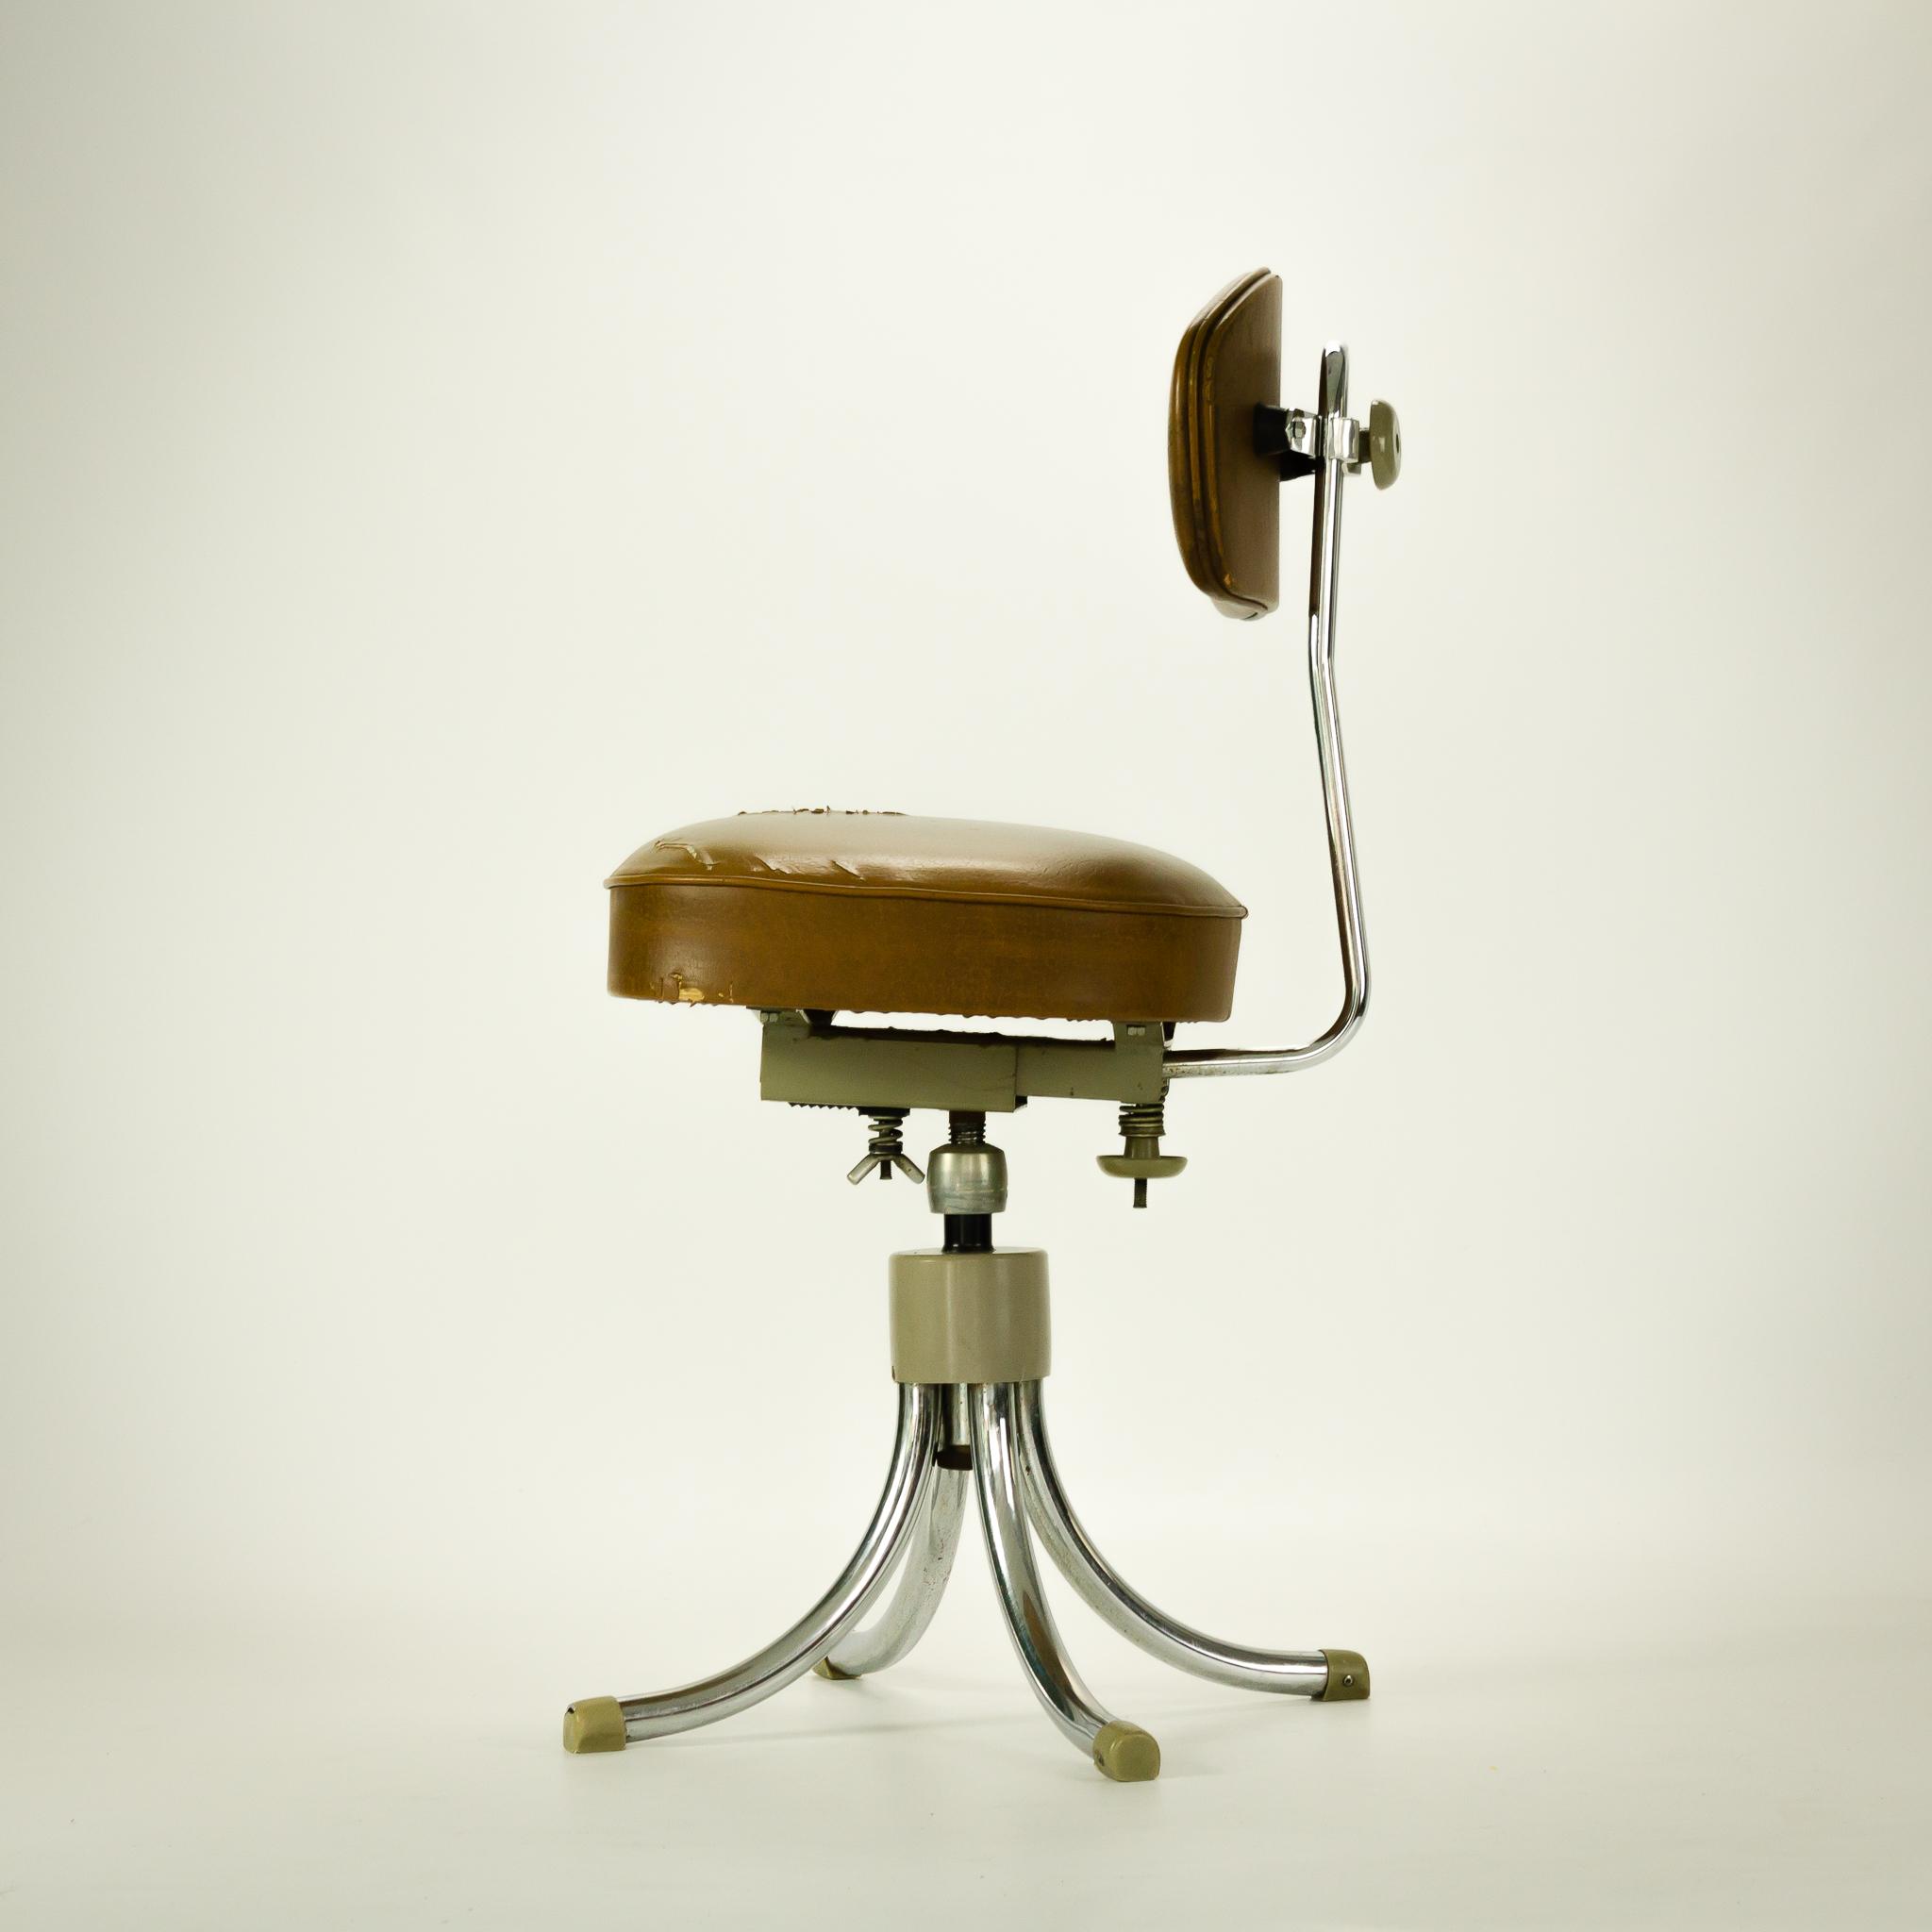 50 u2019s Gispen stijl bureaustoel mokka bruin skai   BarbMama